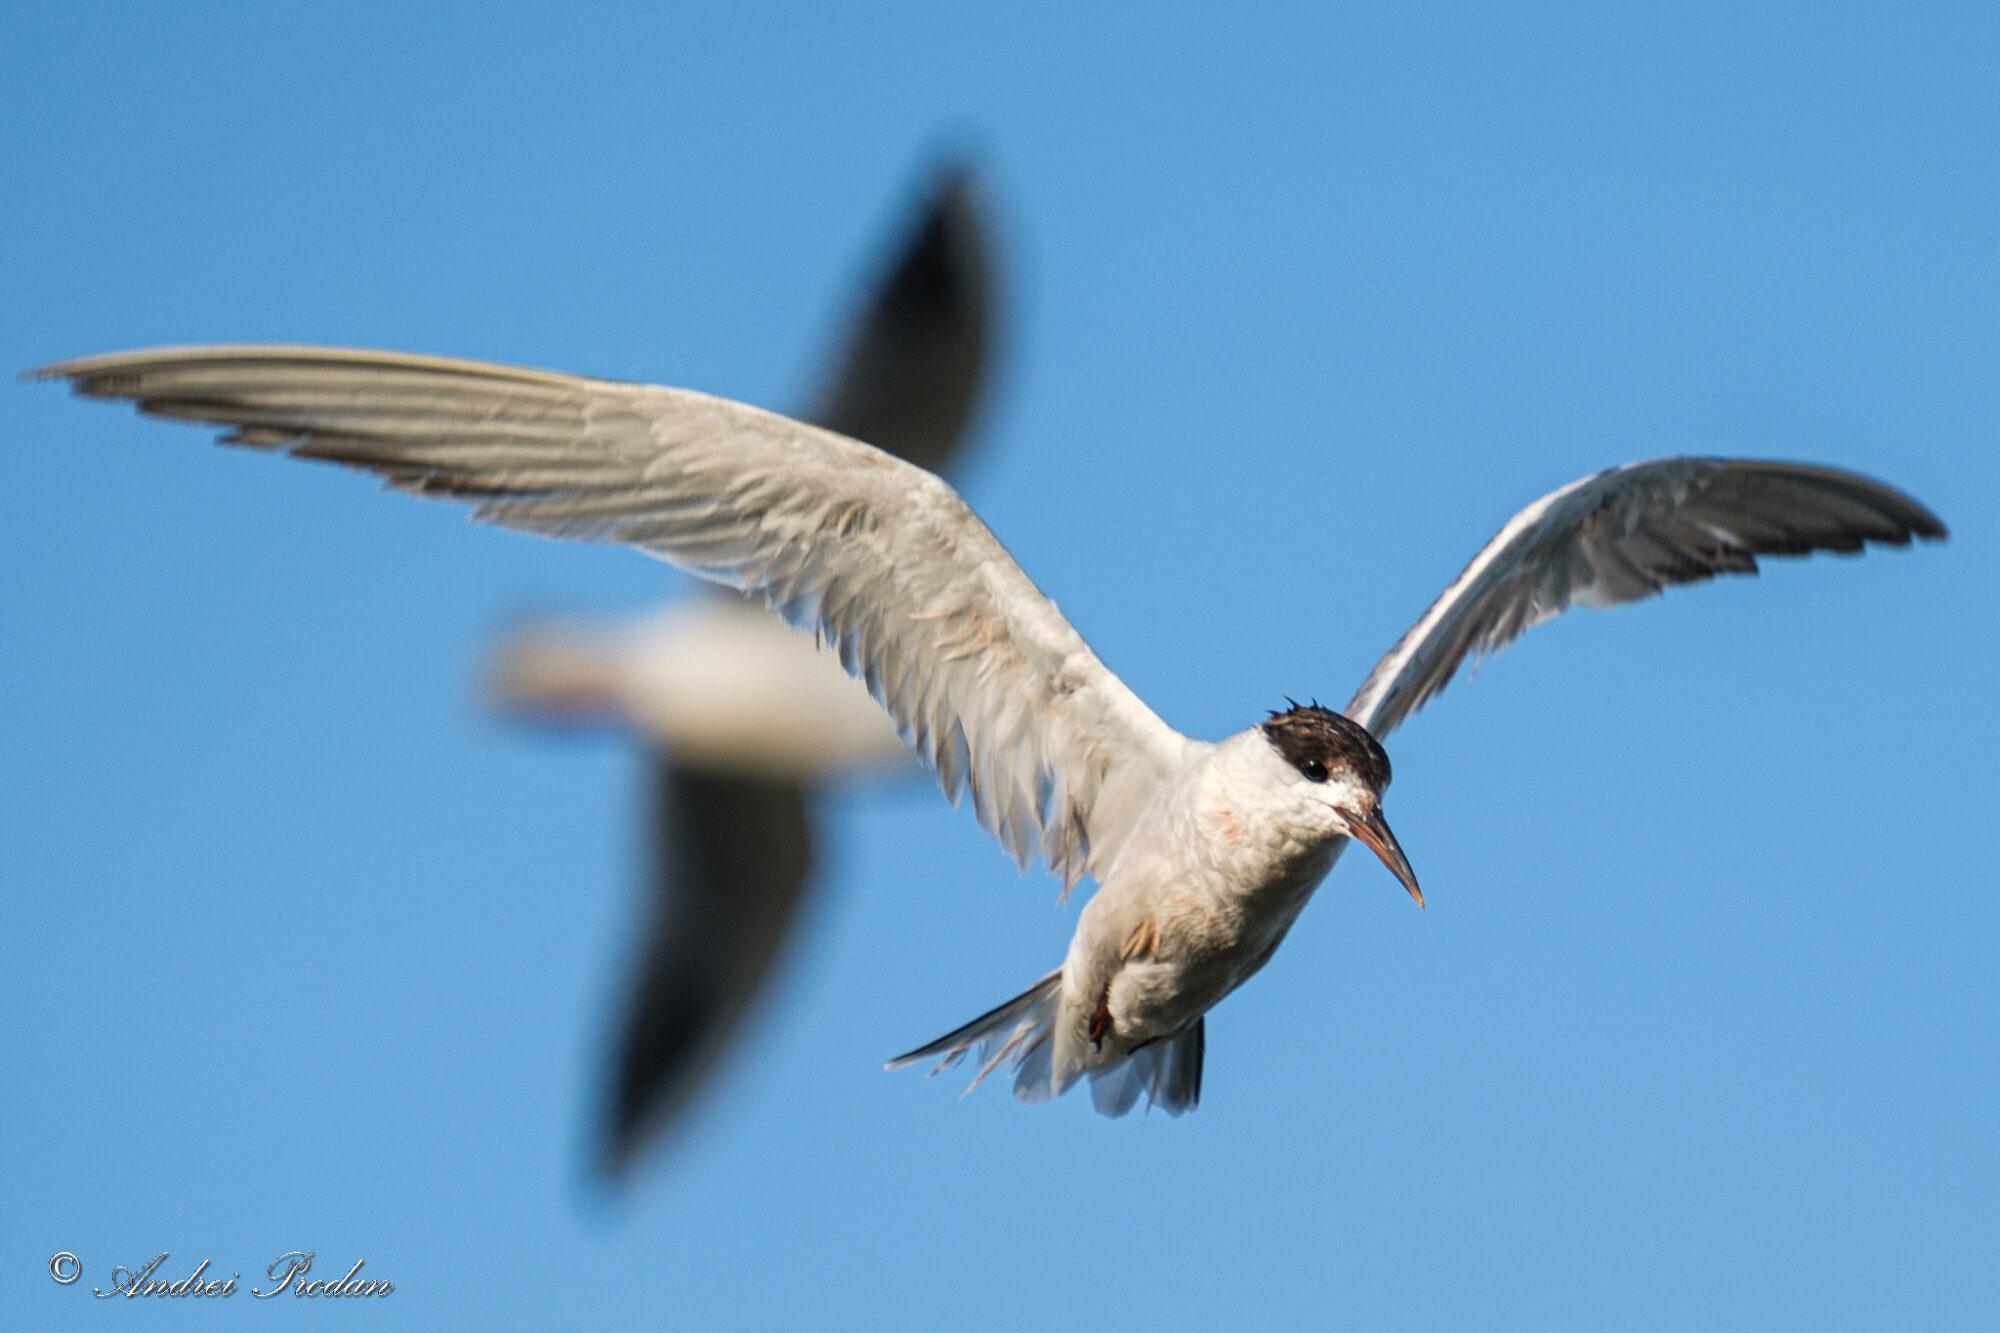 Common tern - Chira de balta - Sterna hirundo